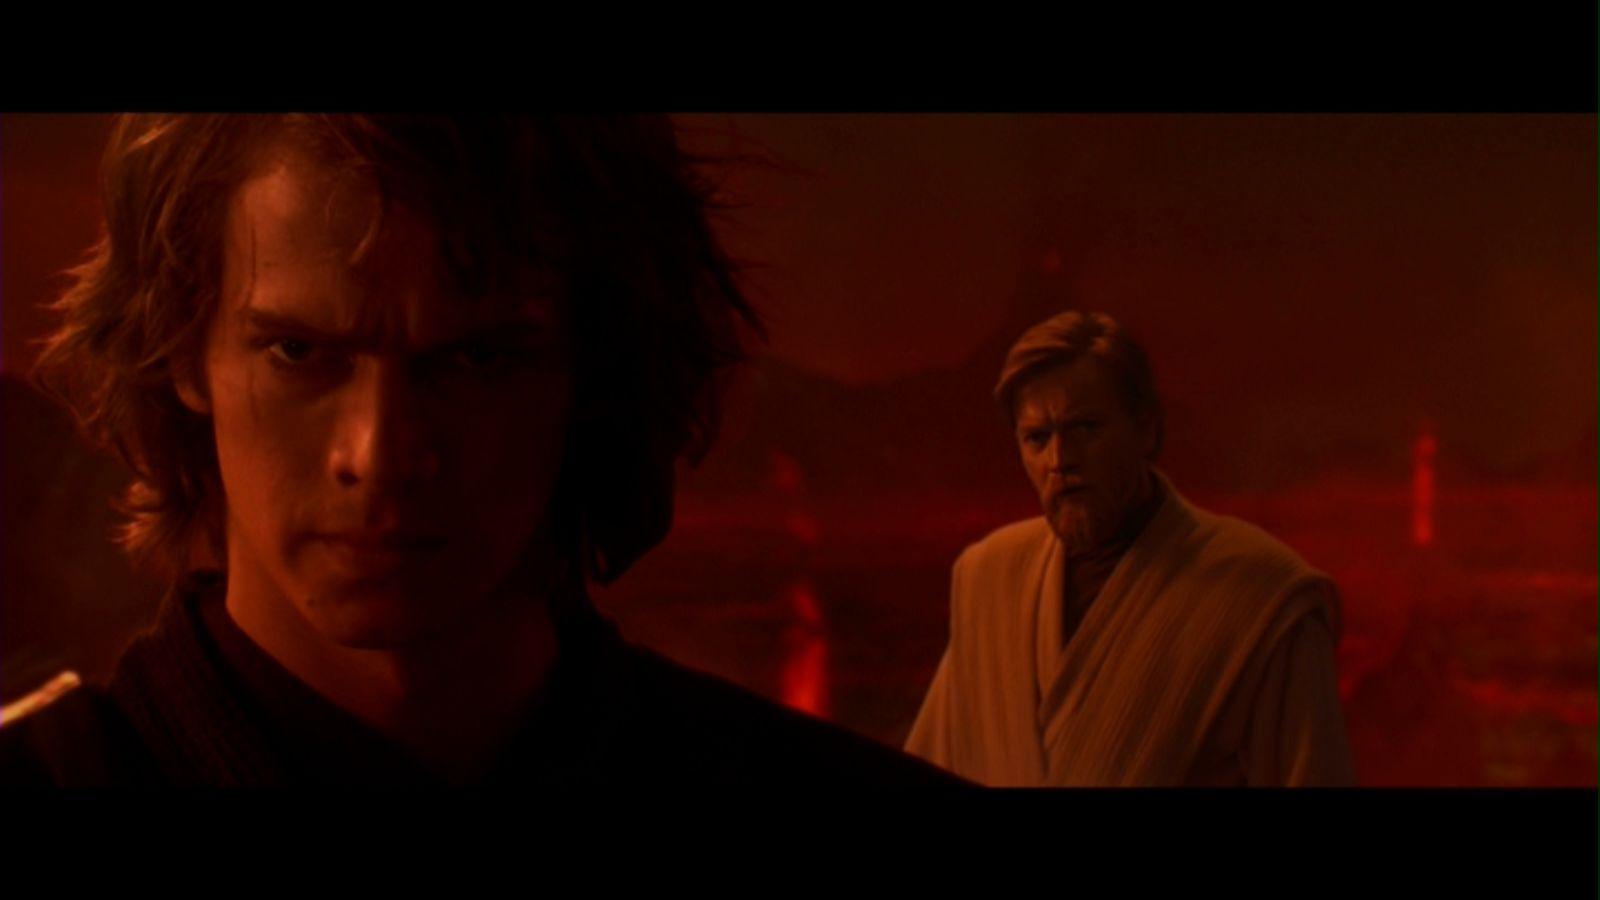 Star Wars Revenge Of The Sith Star Wars Revenge Of The Sith Image 24684861 Fanpop